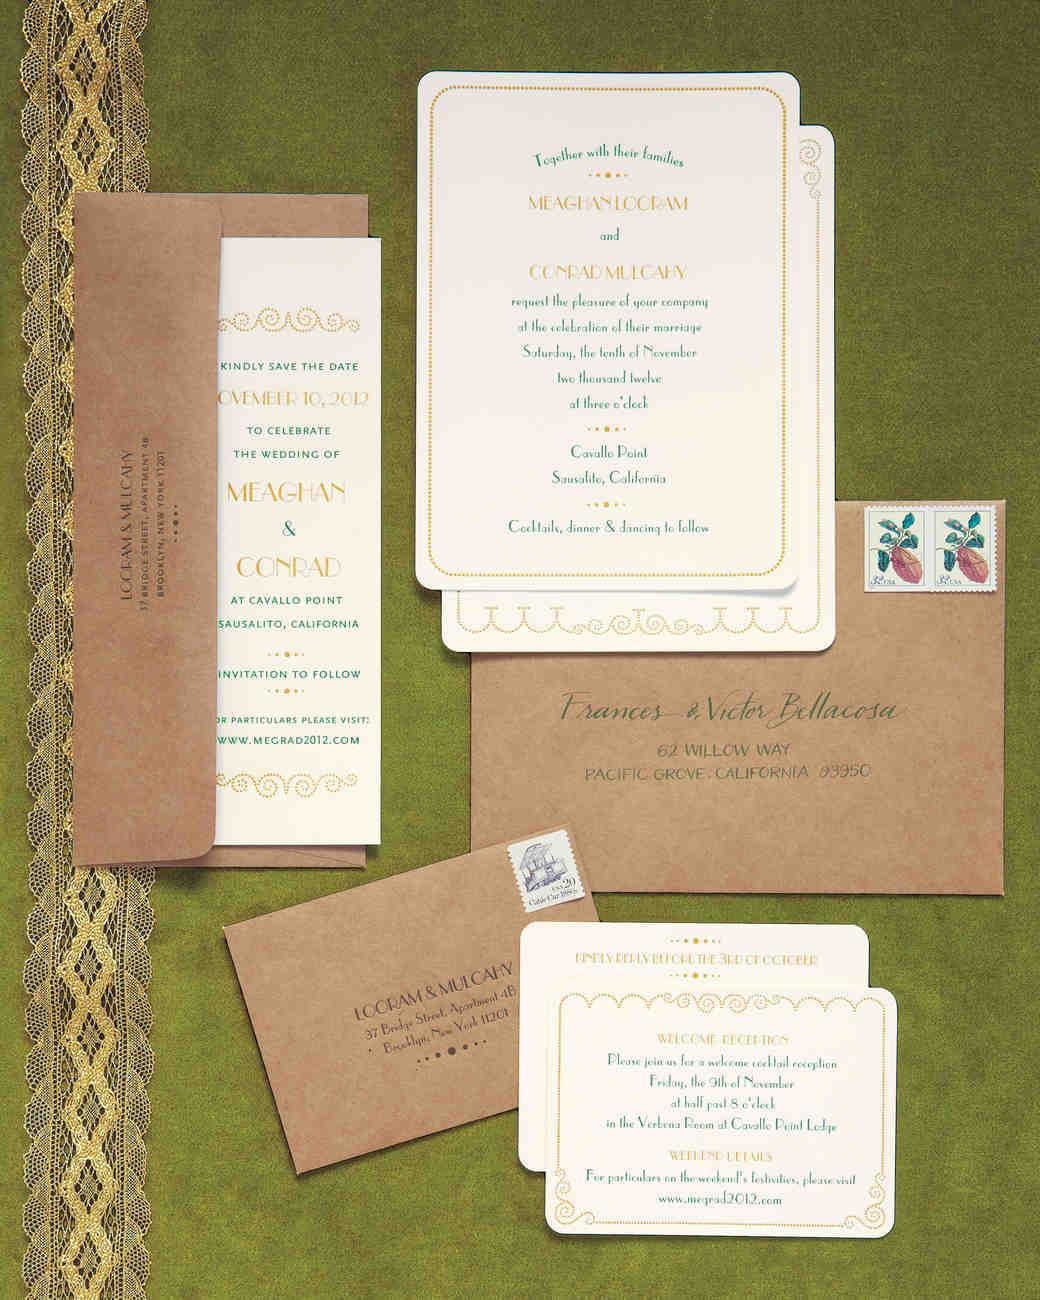 meaghan-conrad-invitations-0112-mwd109593.jpg